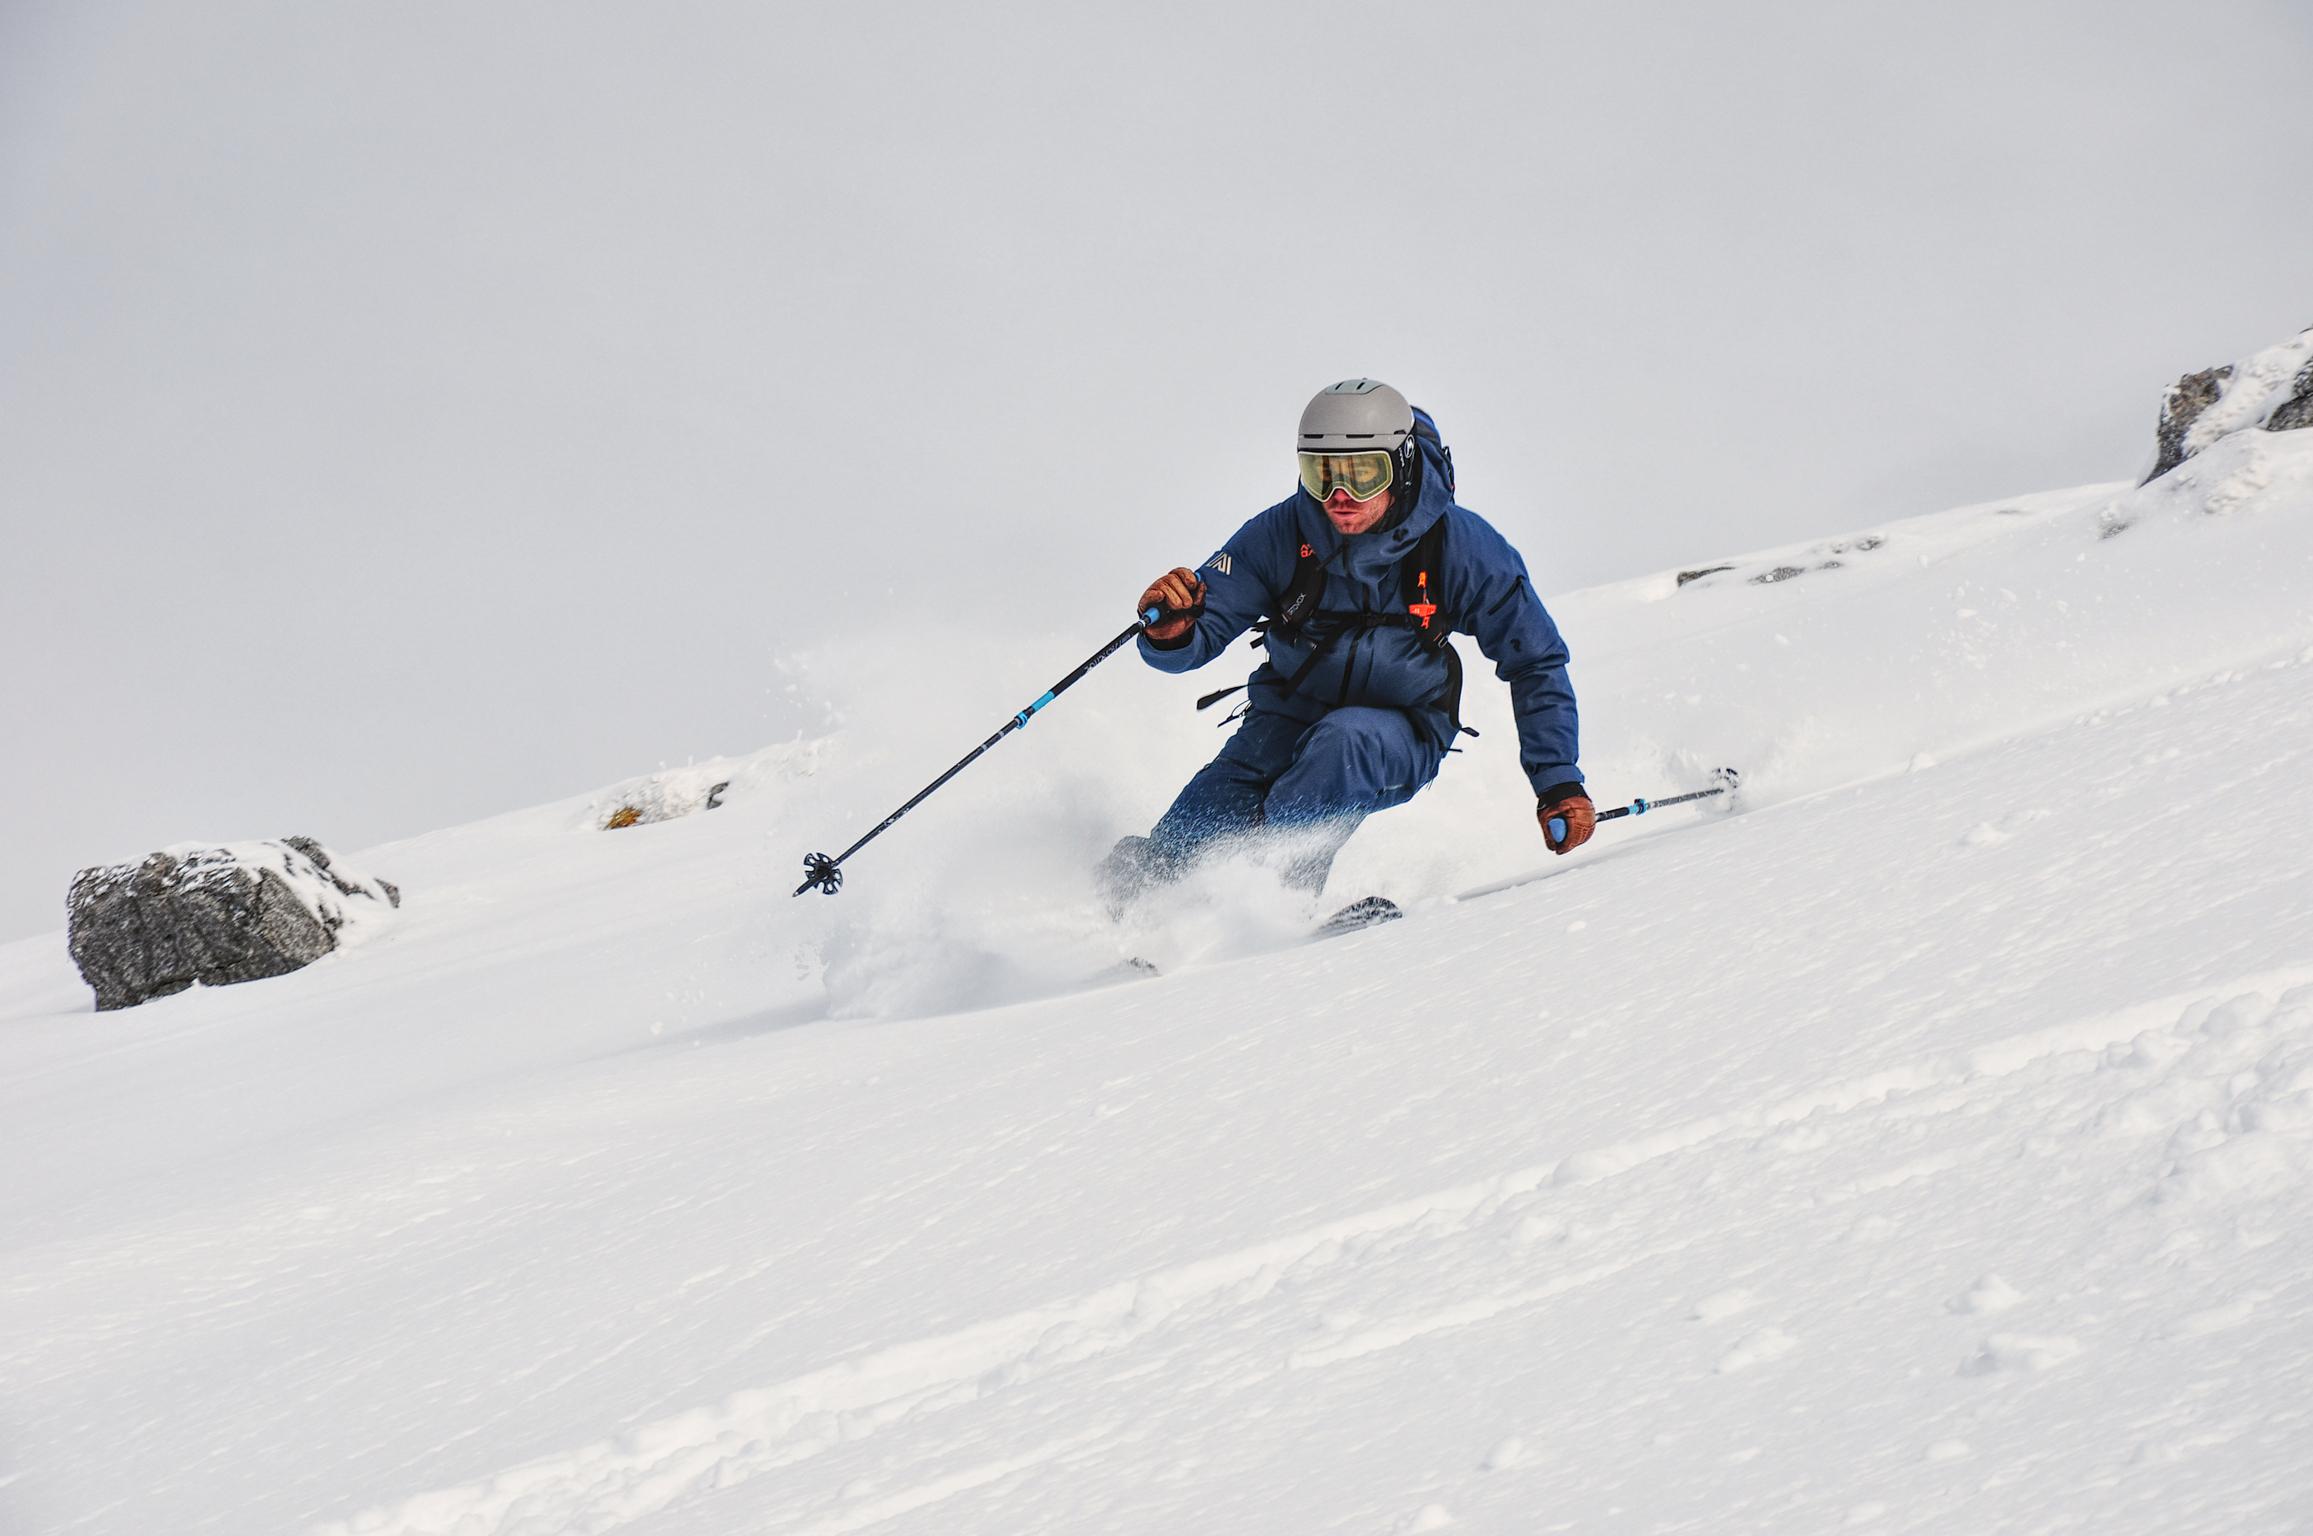 Marc skiing off piste